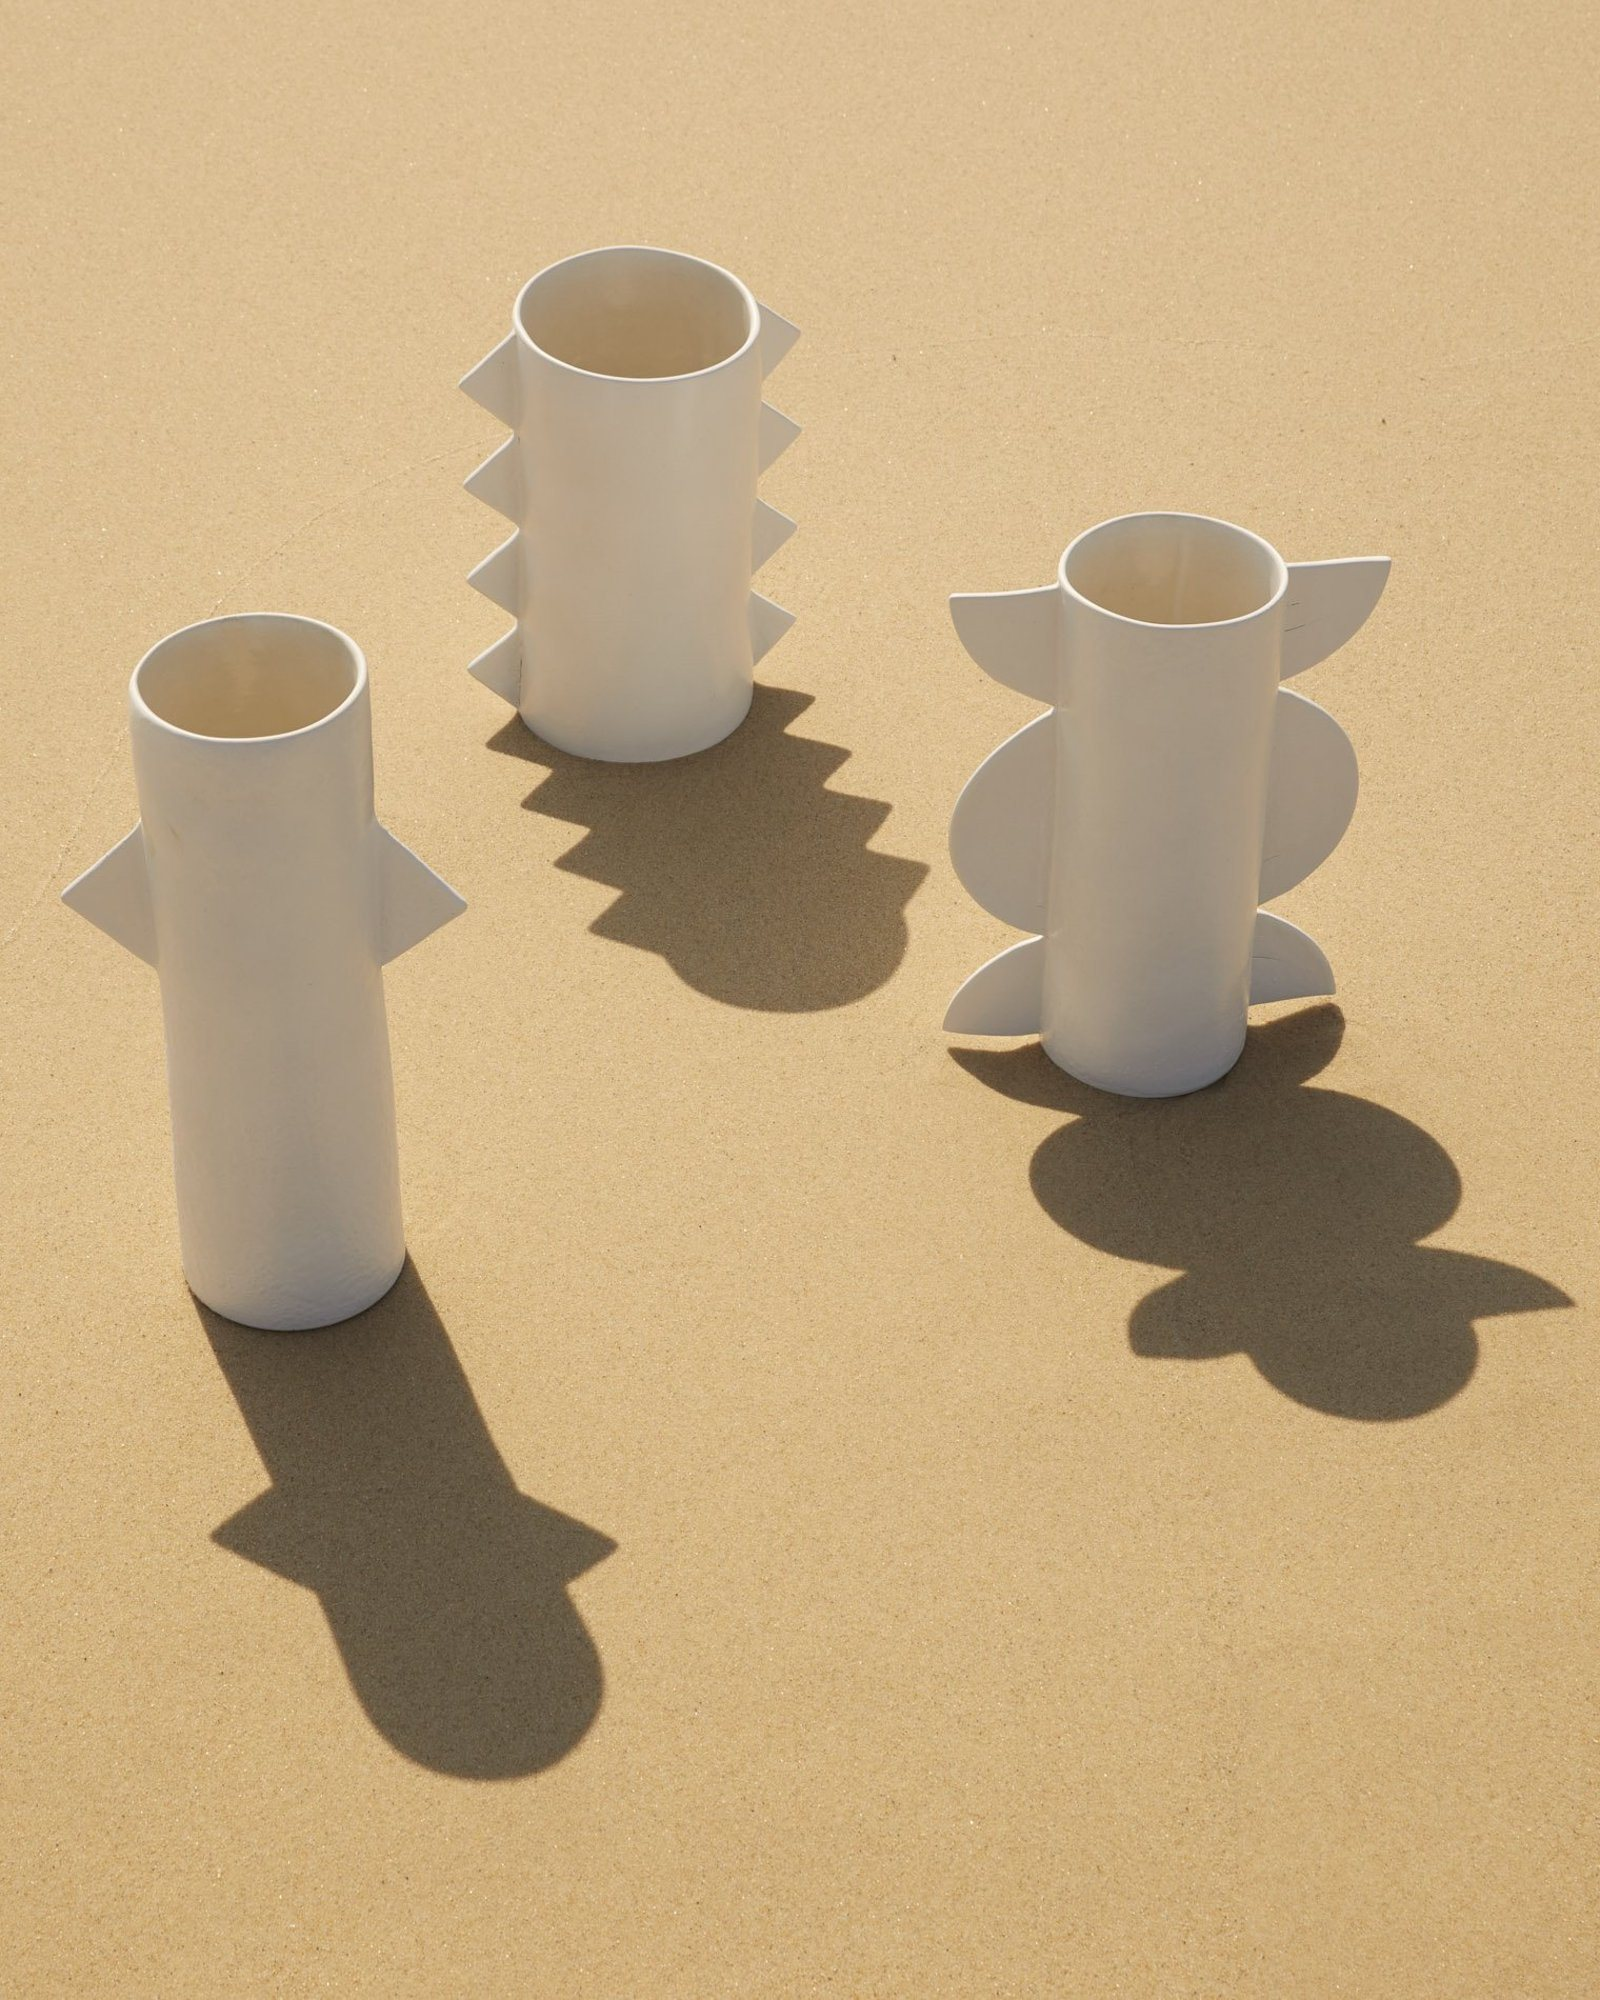 iGNANT-Design-Sarah-Ellison-The-New-Wave-001